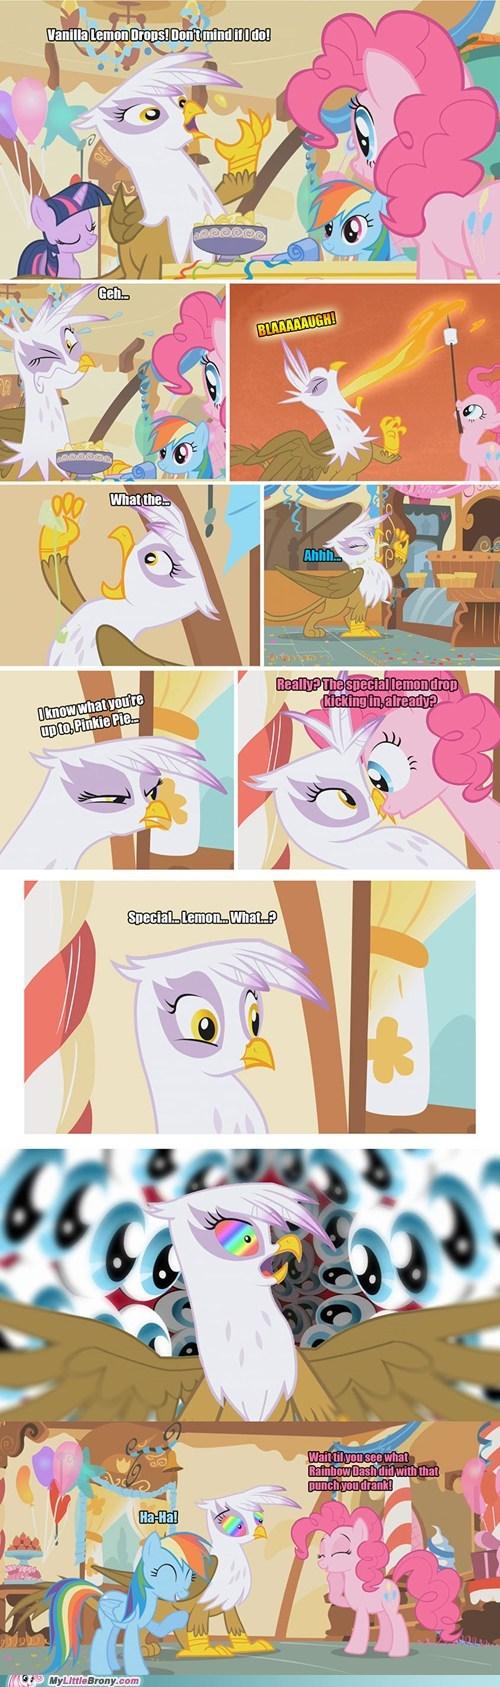 comic comics gilda lemon drops pinkie pie - 6400416512